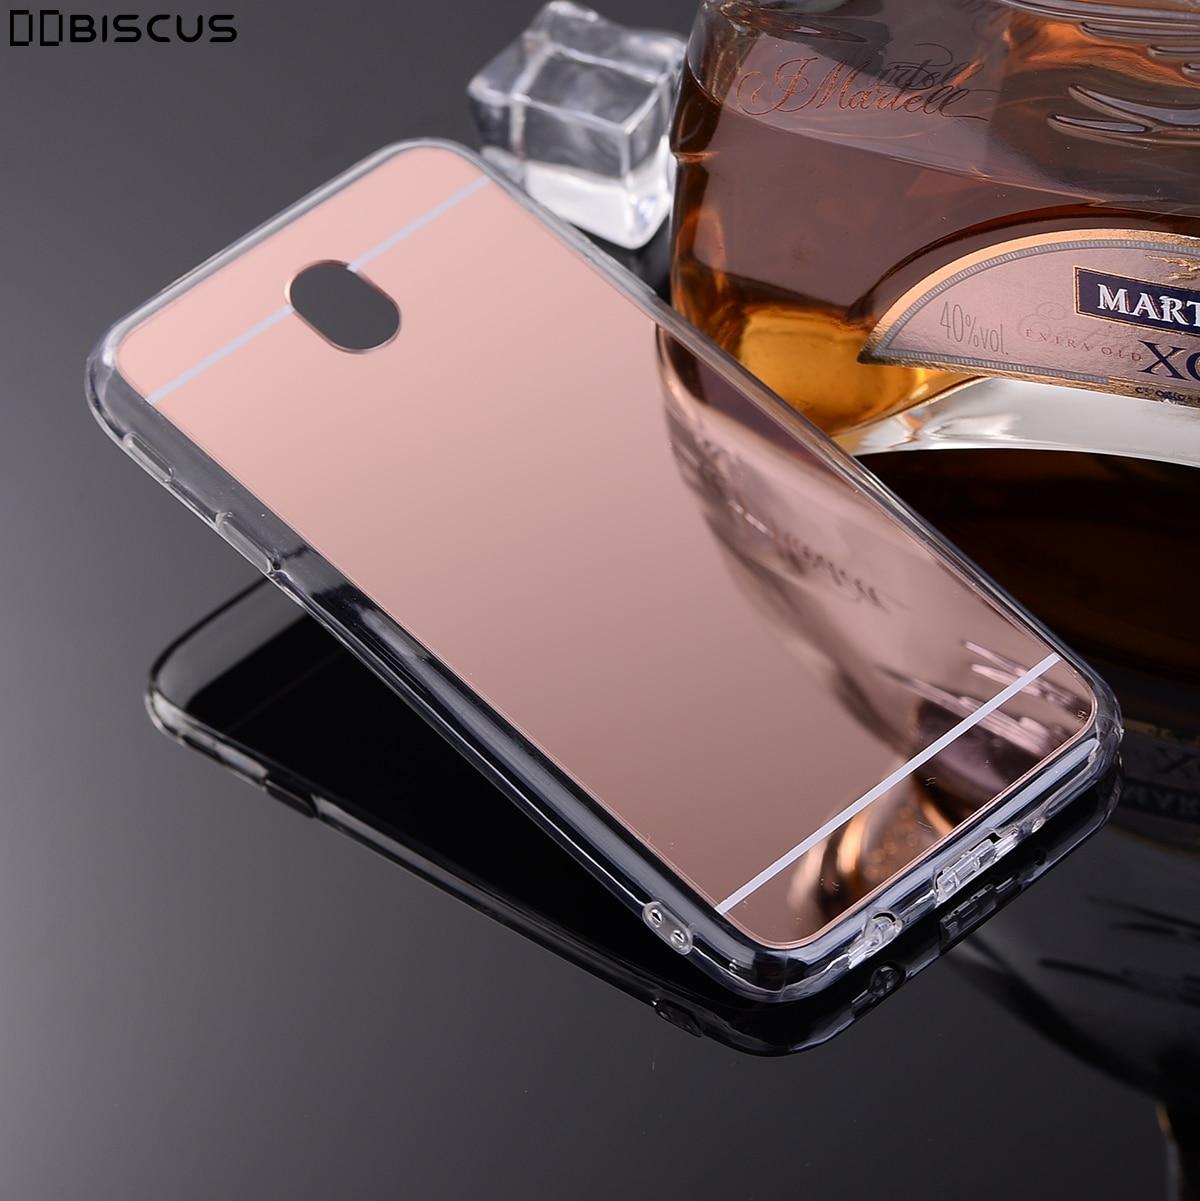 0f93f6f3867 De Lujo espejo suave TPU funda de silicona para Samsung Galaxy J7 2017 Pro  J730FM J730F